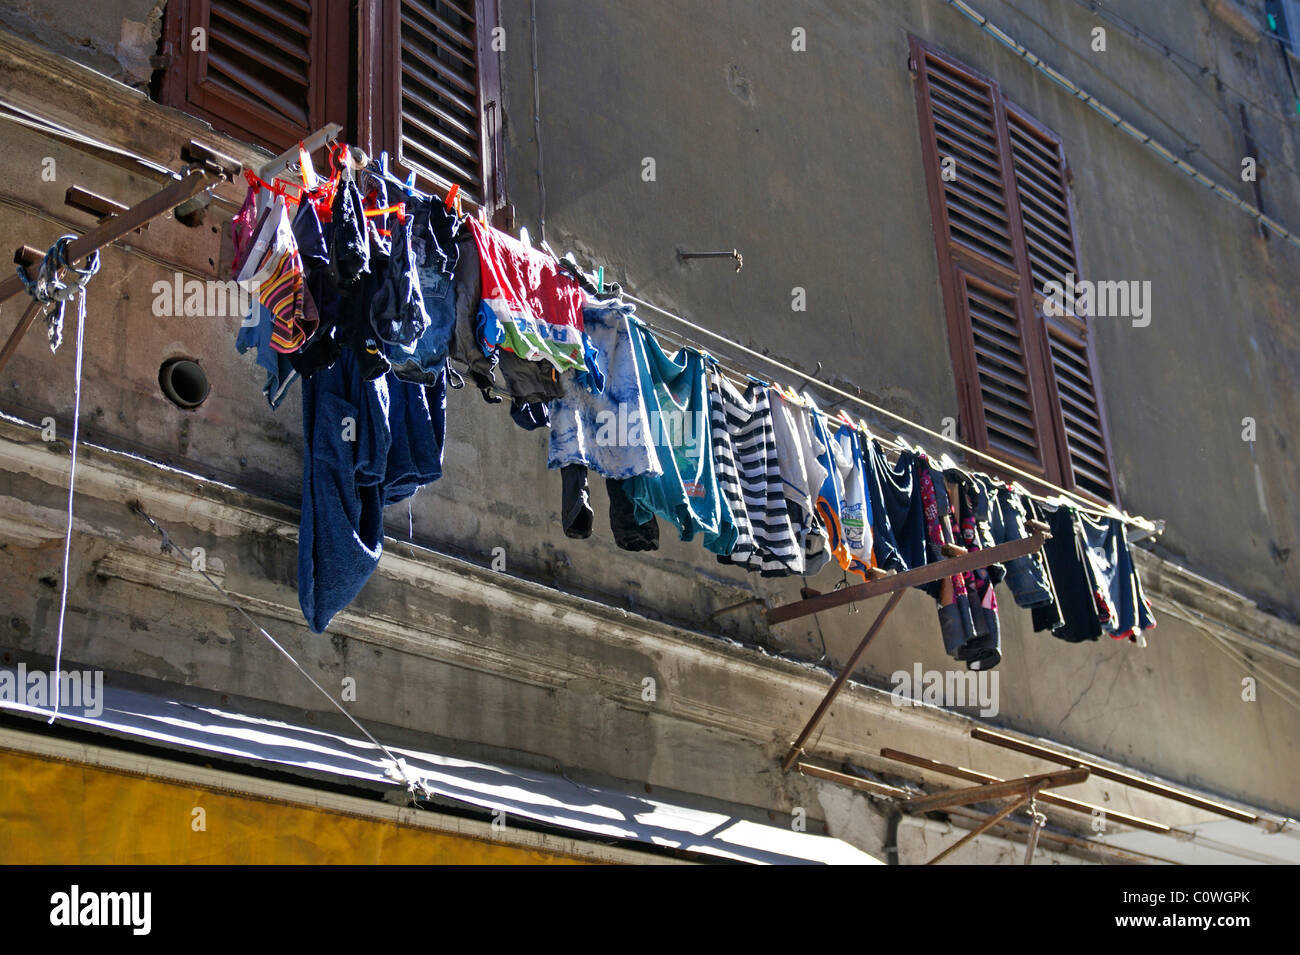 clothesline in Napoli Italy - Stock Image